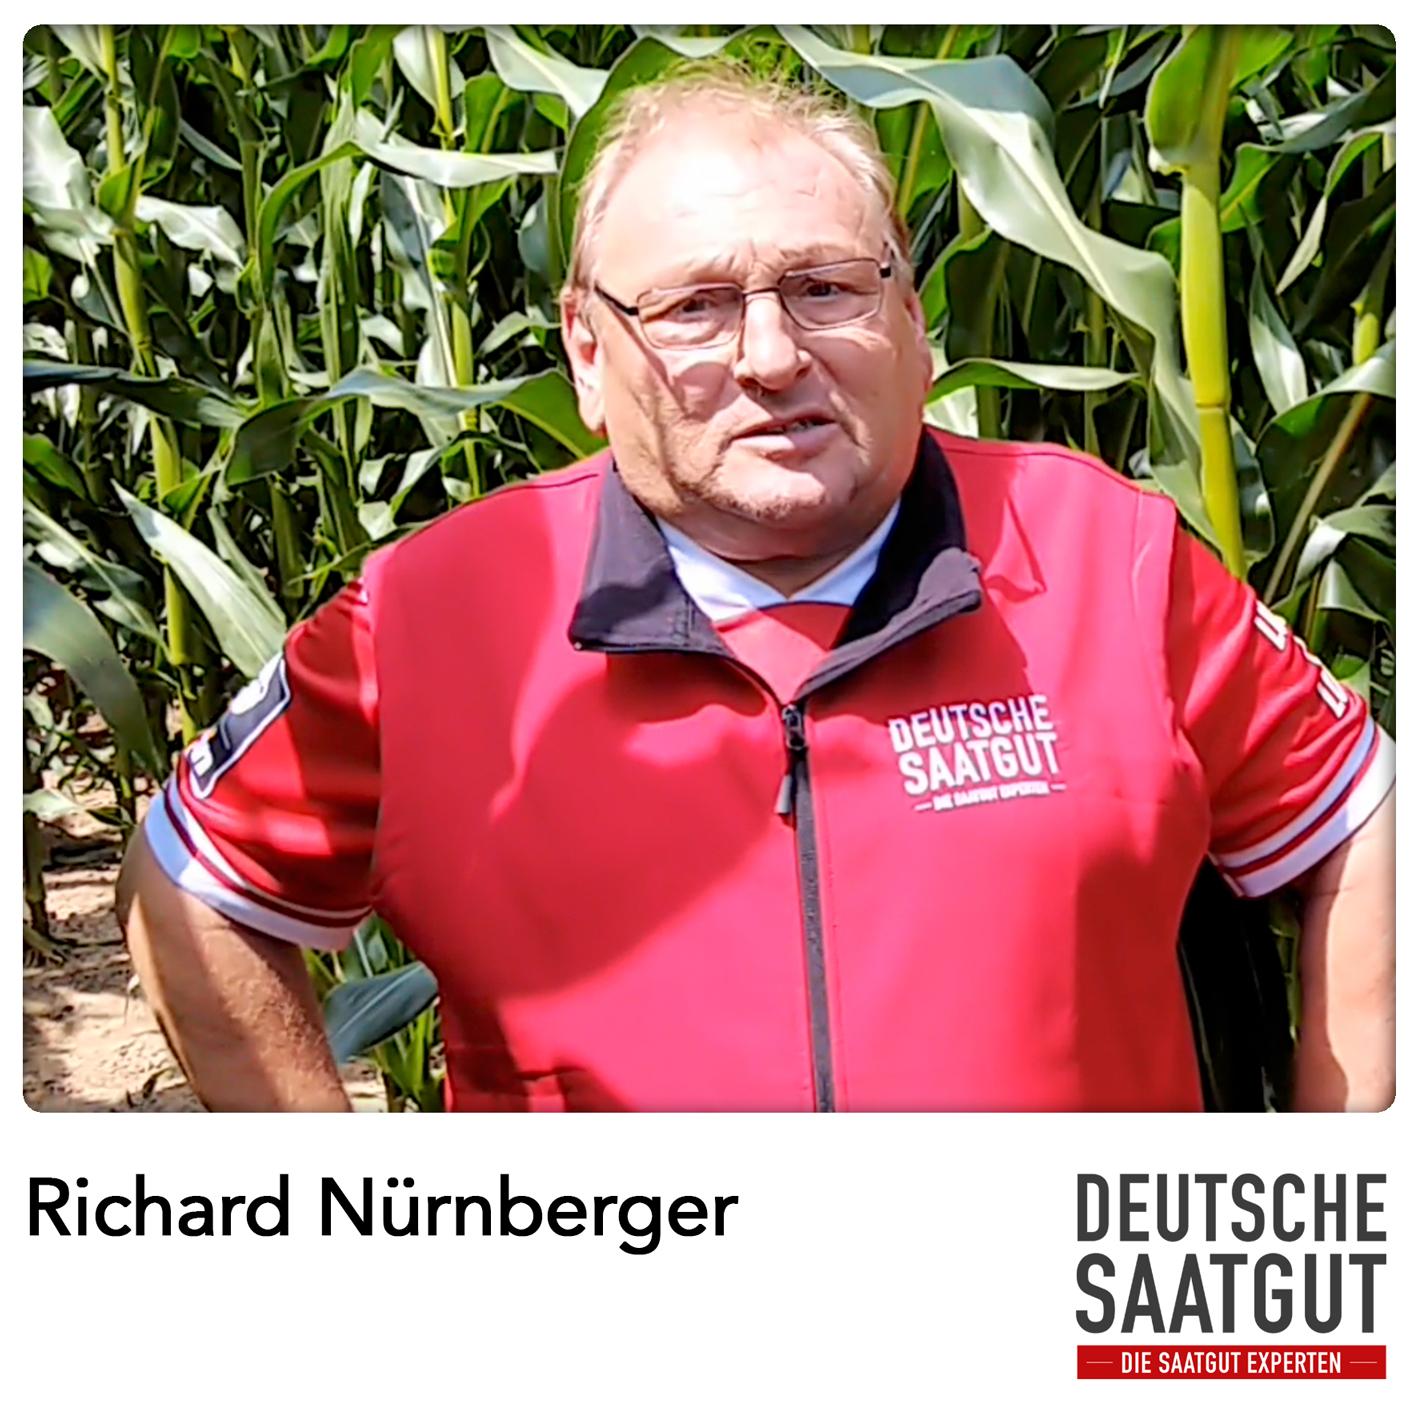 Richard Nürnberger beim Mais-Exaktversuch in Markt Erlbach, im Landkreis Neustadt an der Aisch-Bad Windsheim